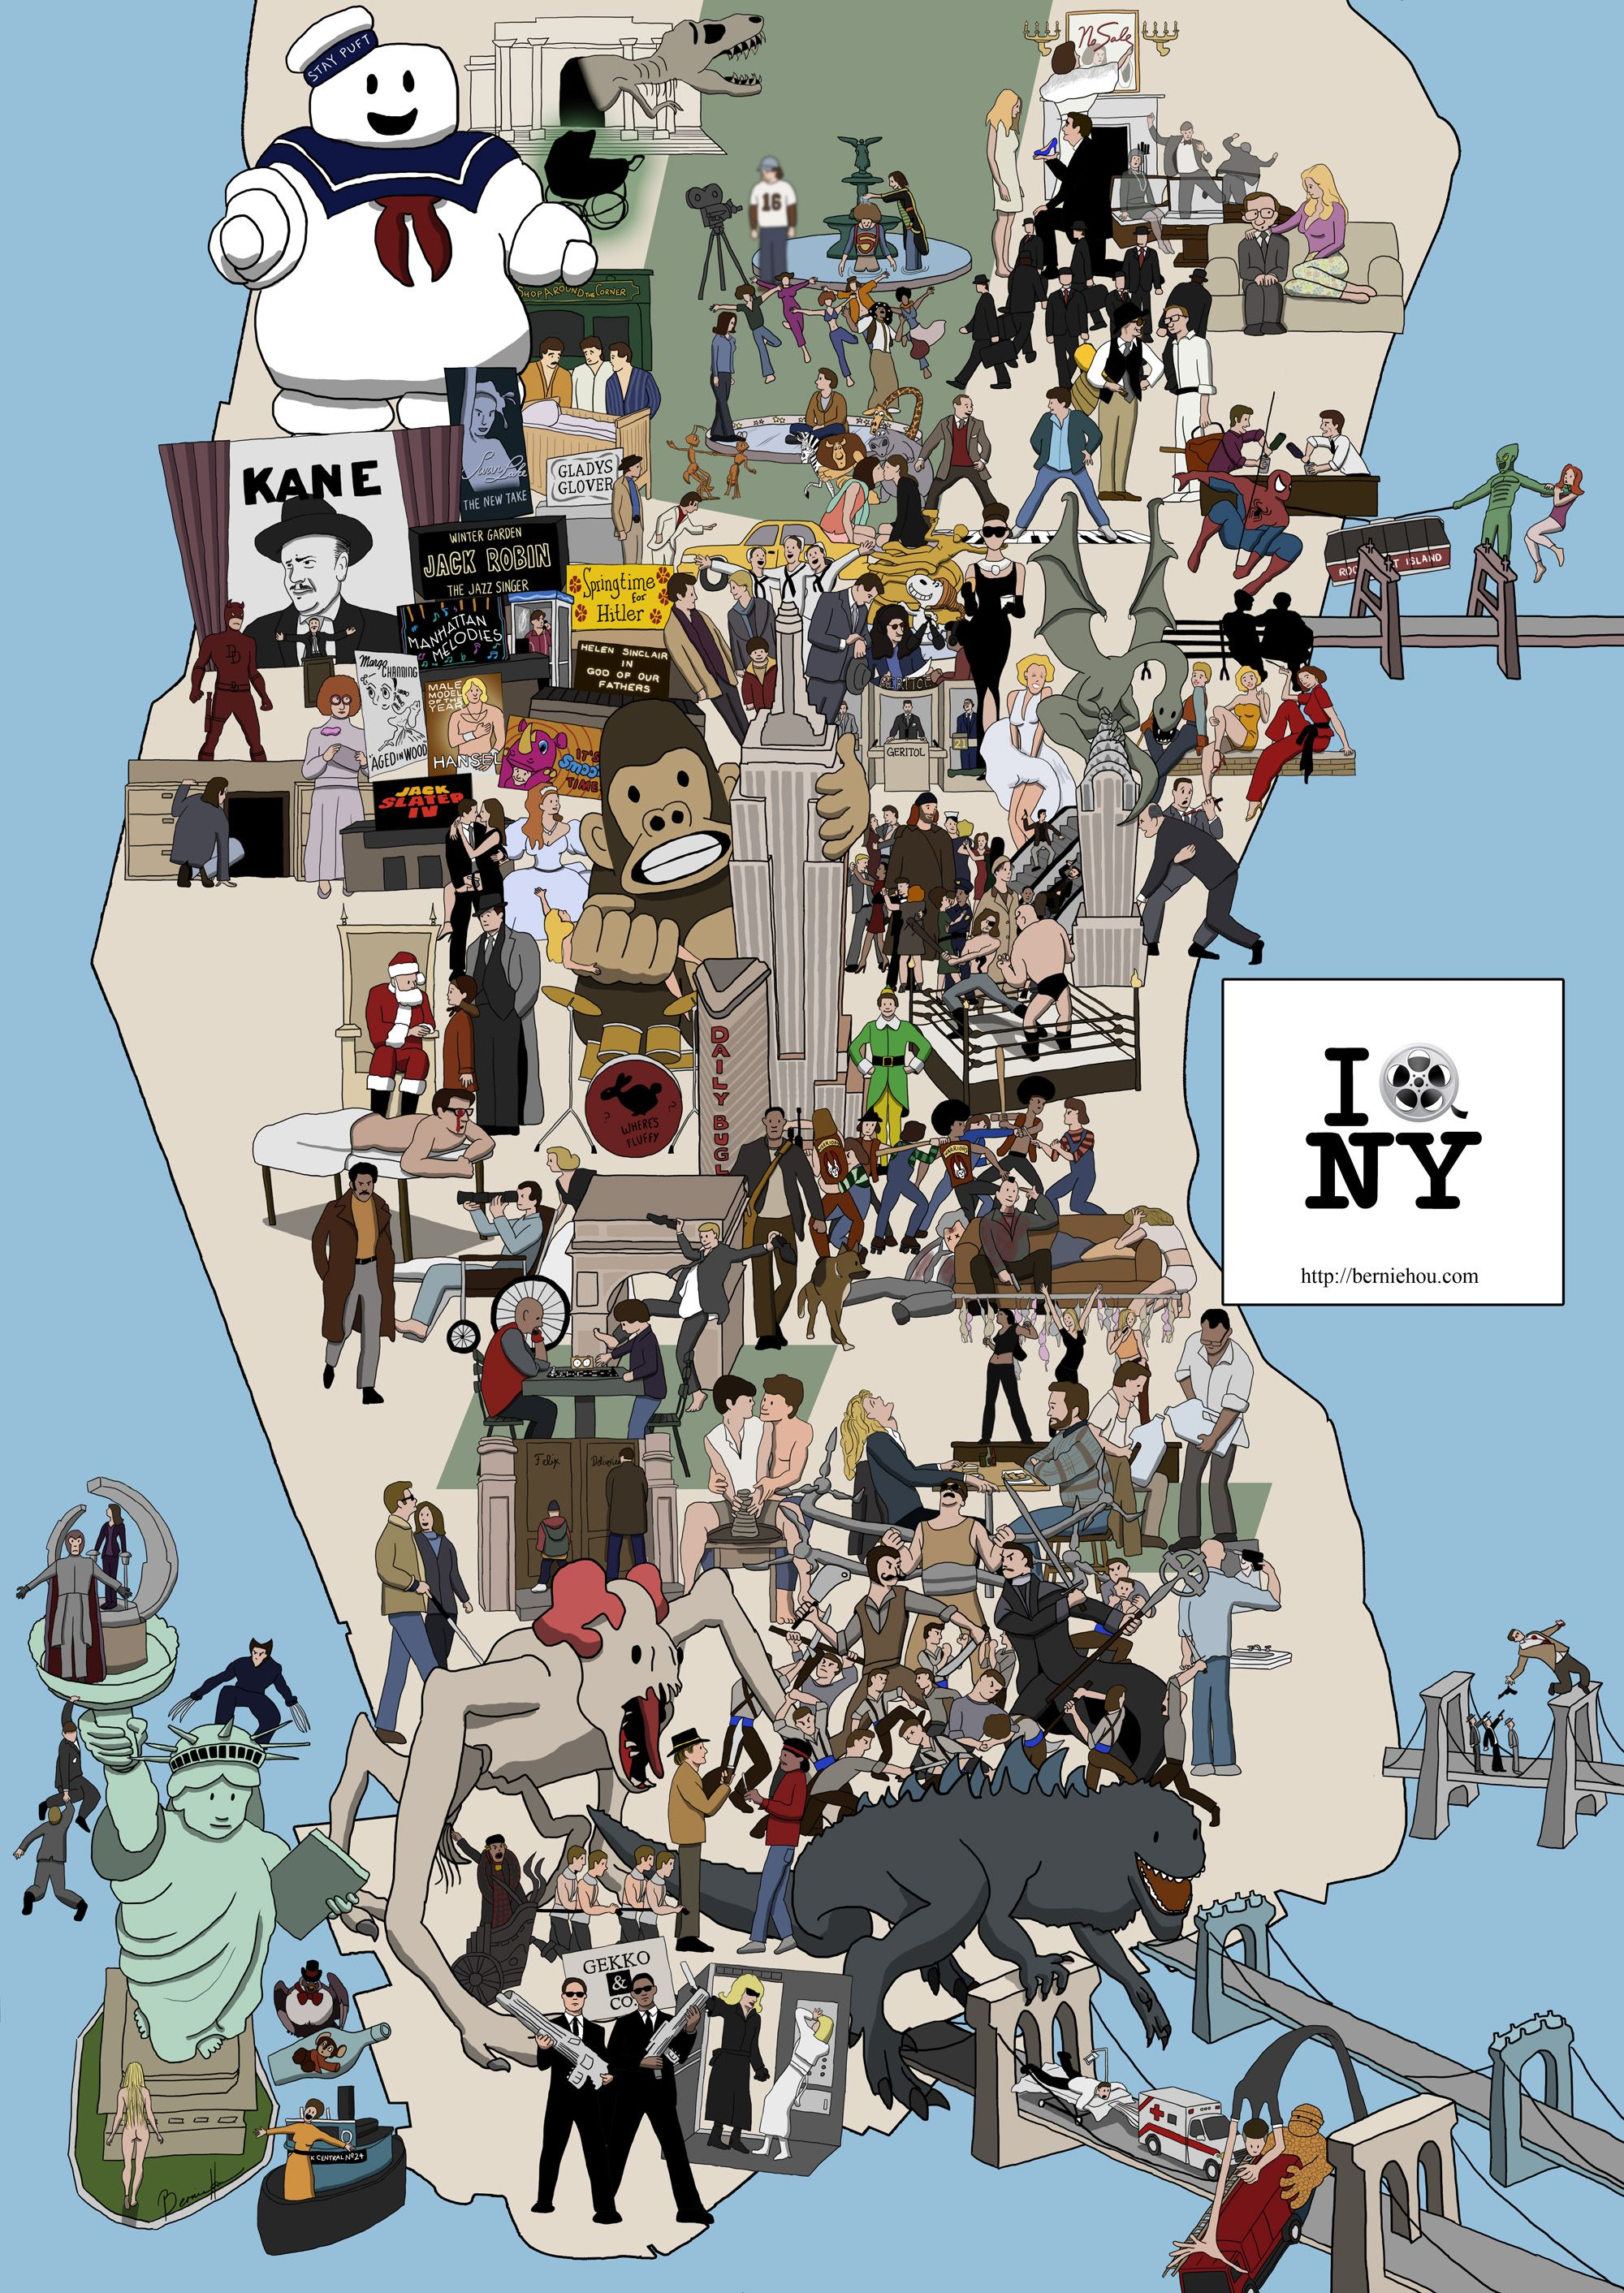 NY Movie Map The Great Location Cinema Pinterest Пришельцы - New york map location